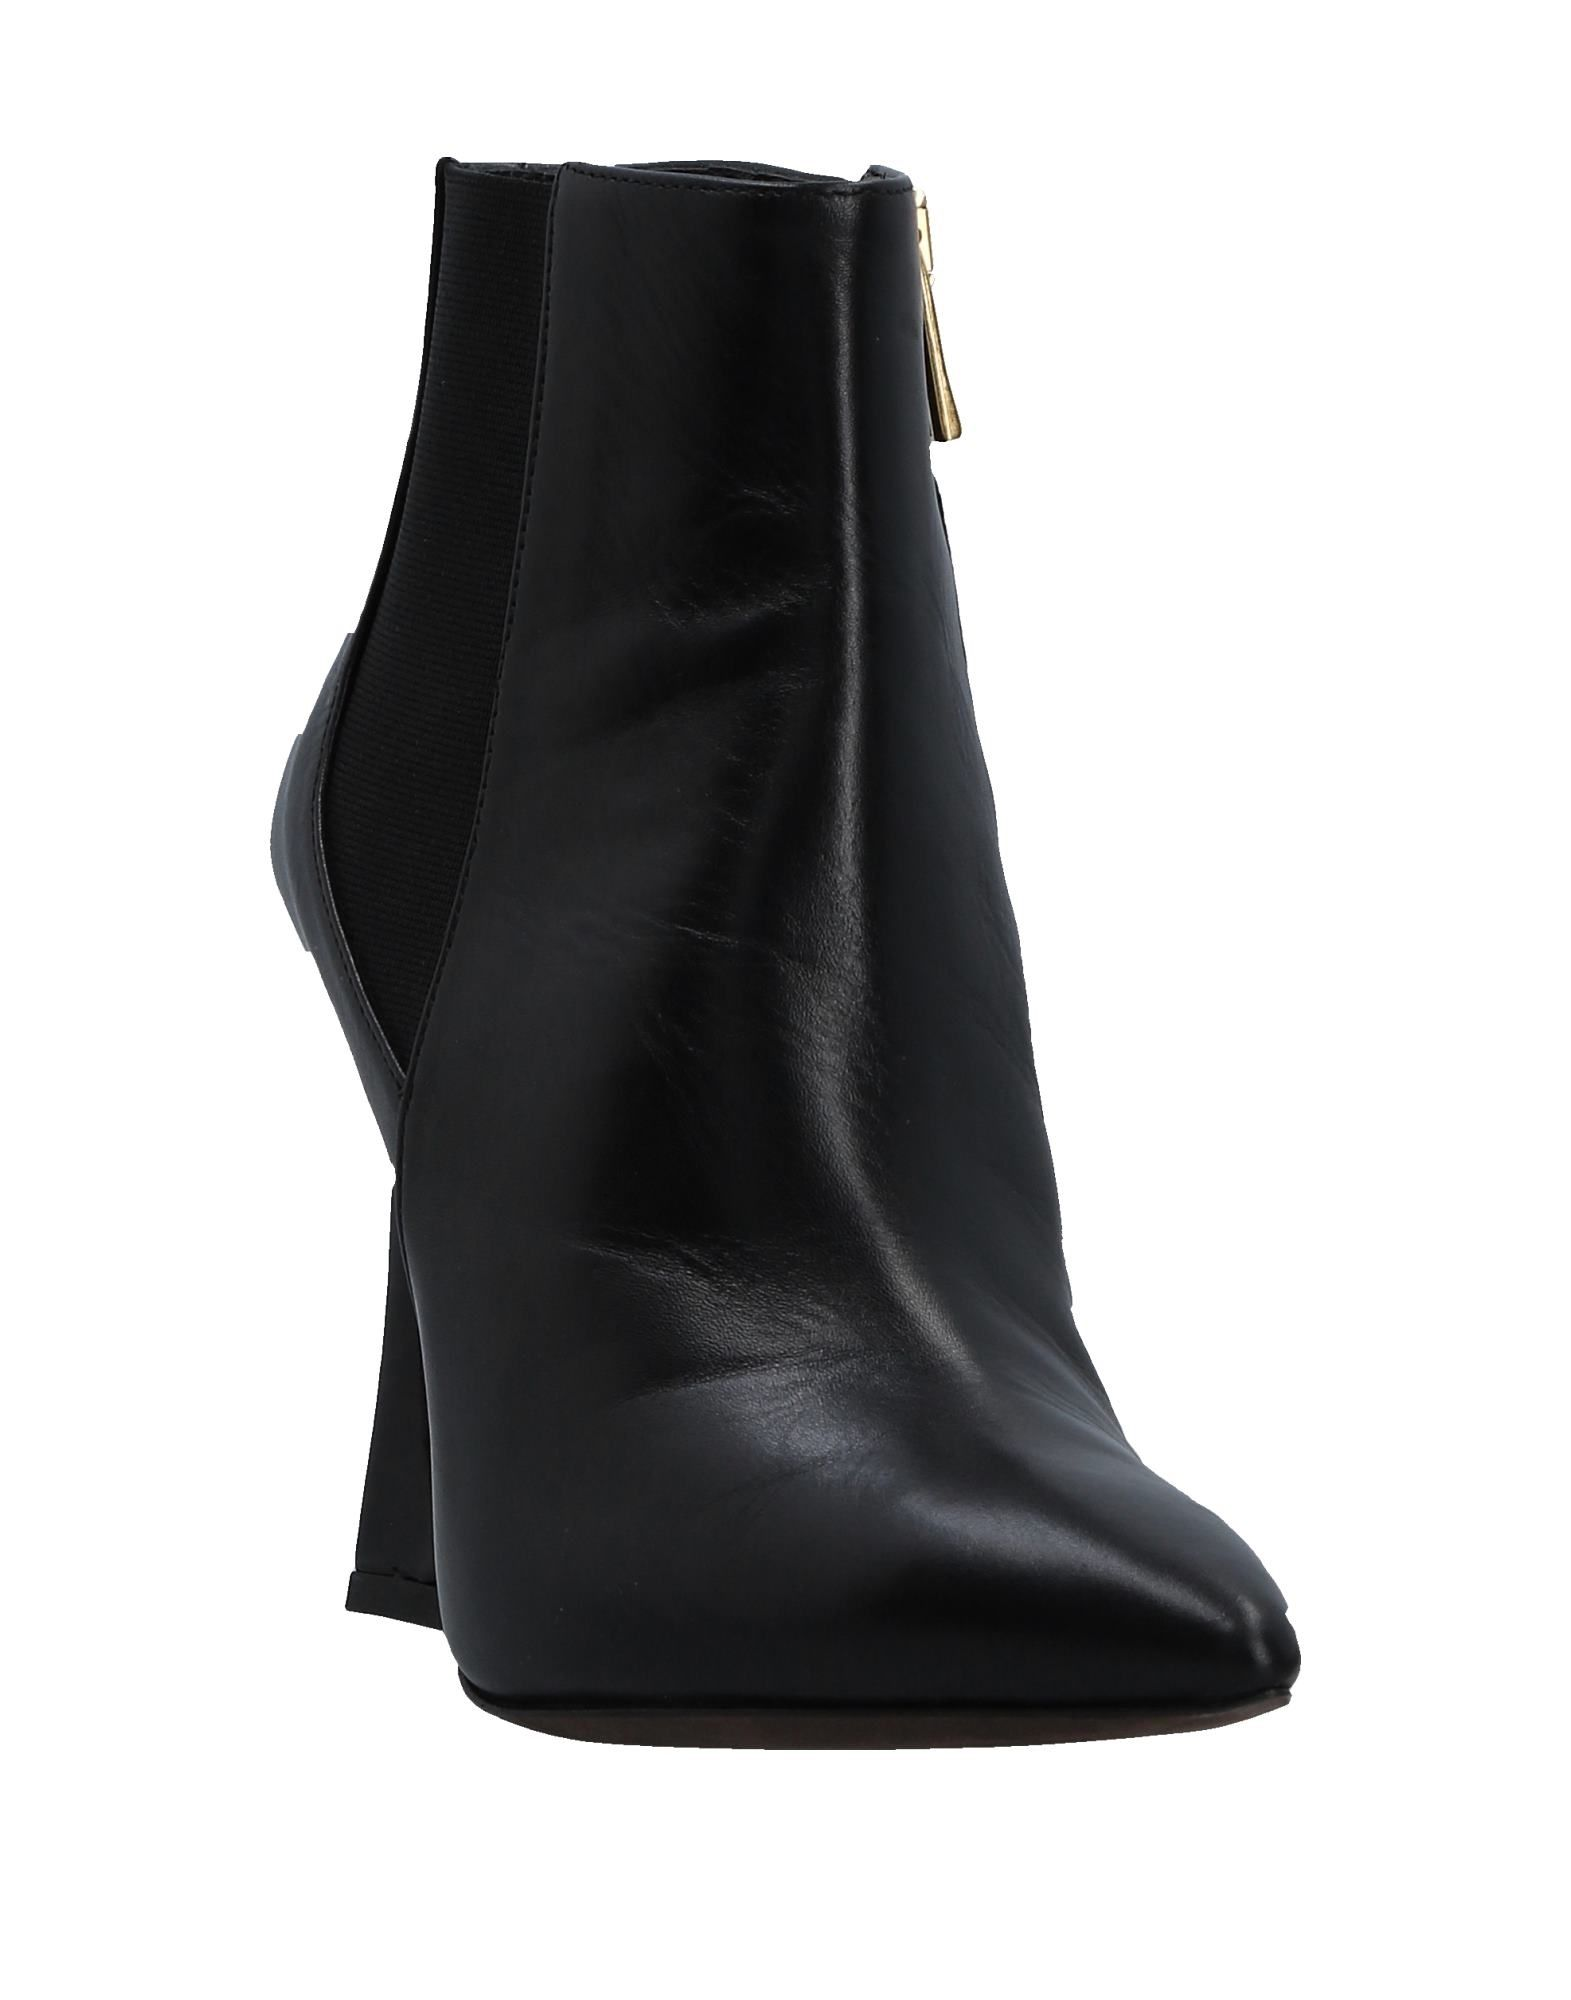 Stilvolle billige Boots Schuhe Andrea Morando Chelsea Boots billige Damen  11525278IE 93f9f3